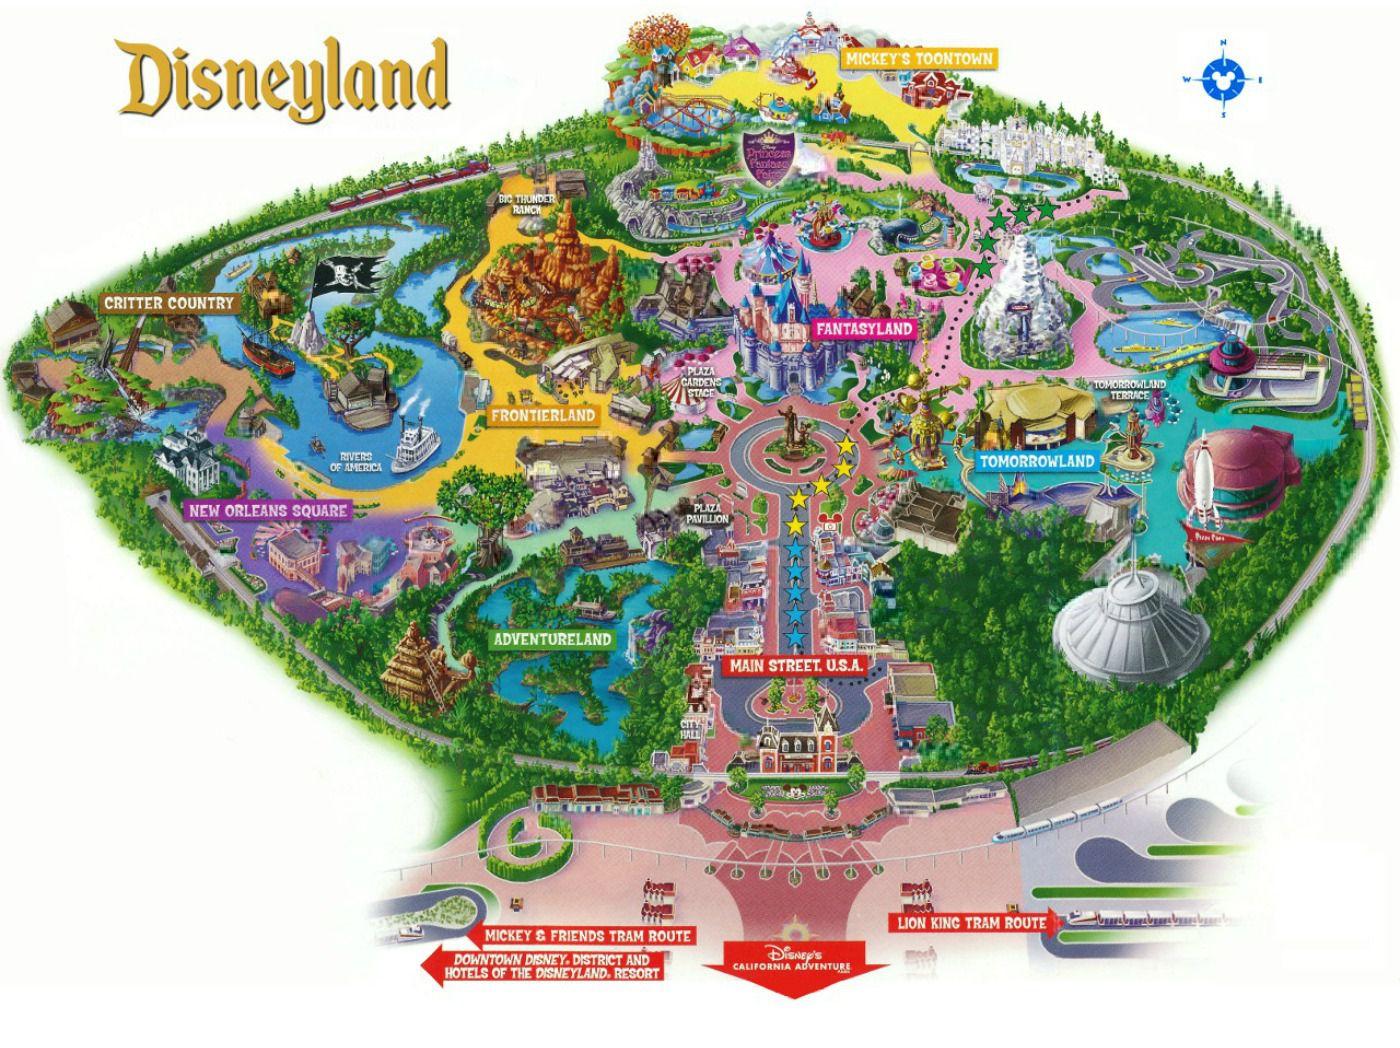 Maps Of Disneyland Resort In Anaheim, California - Disney California Map